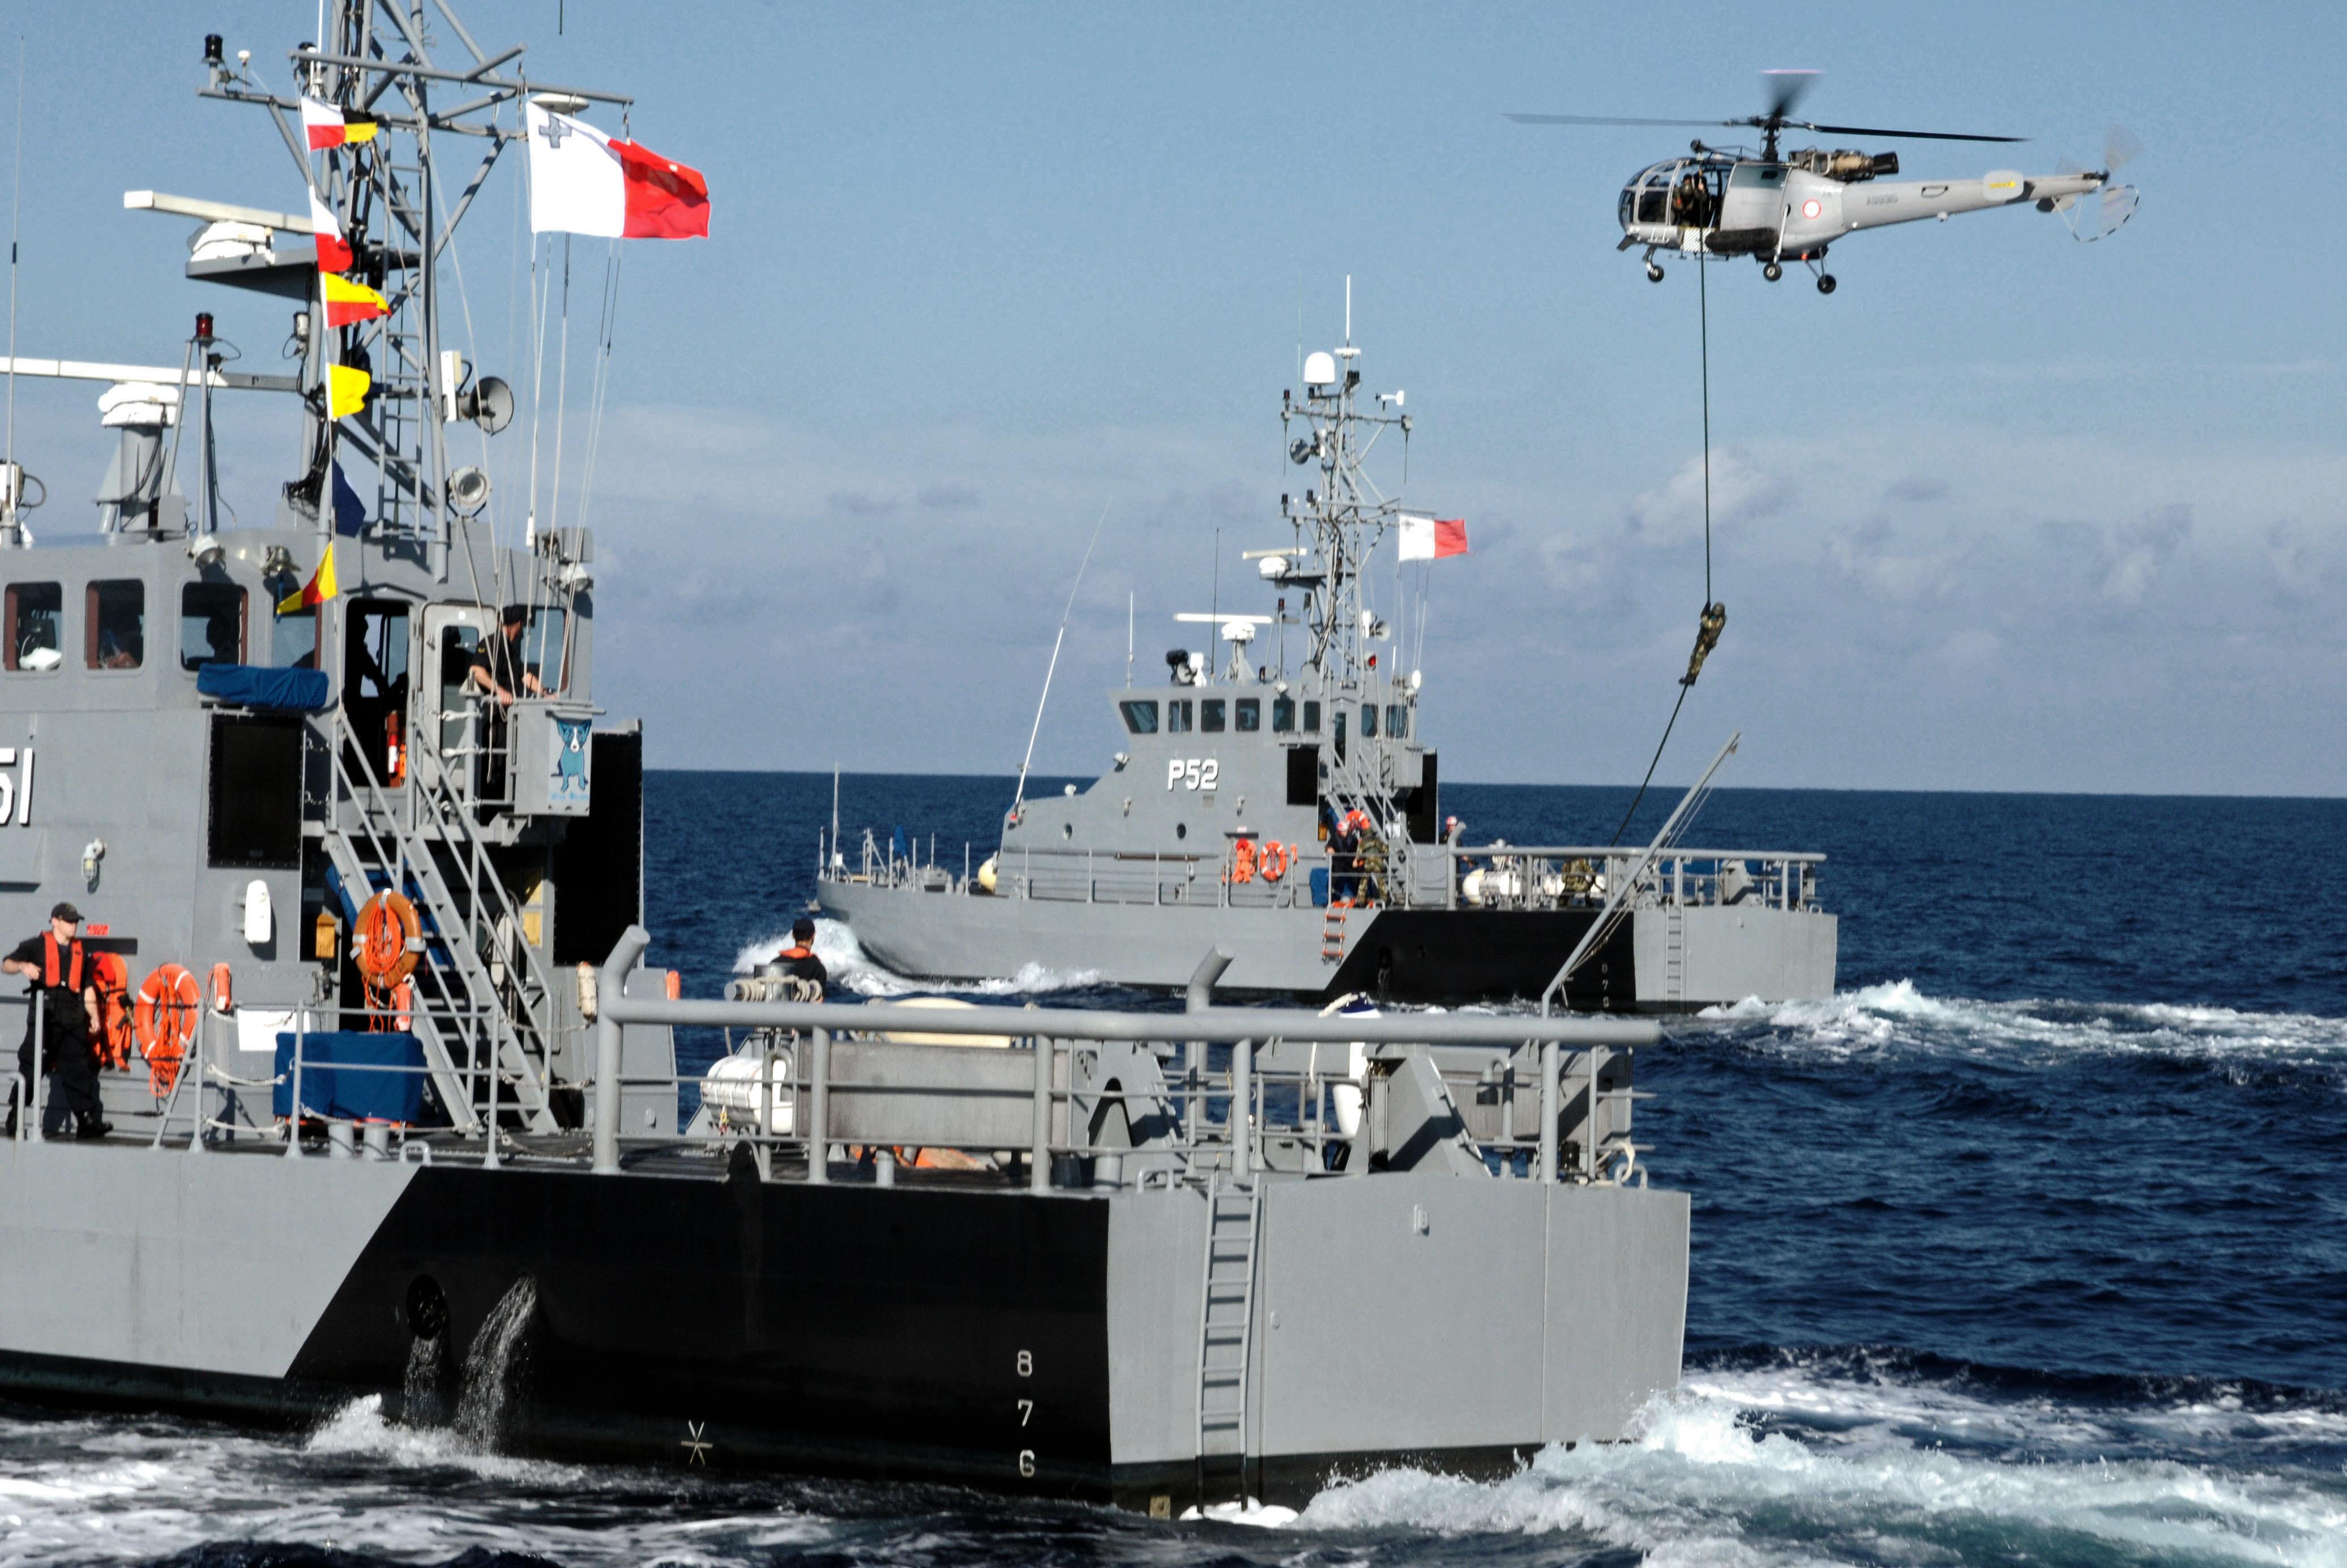 A Marinha Maltesa